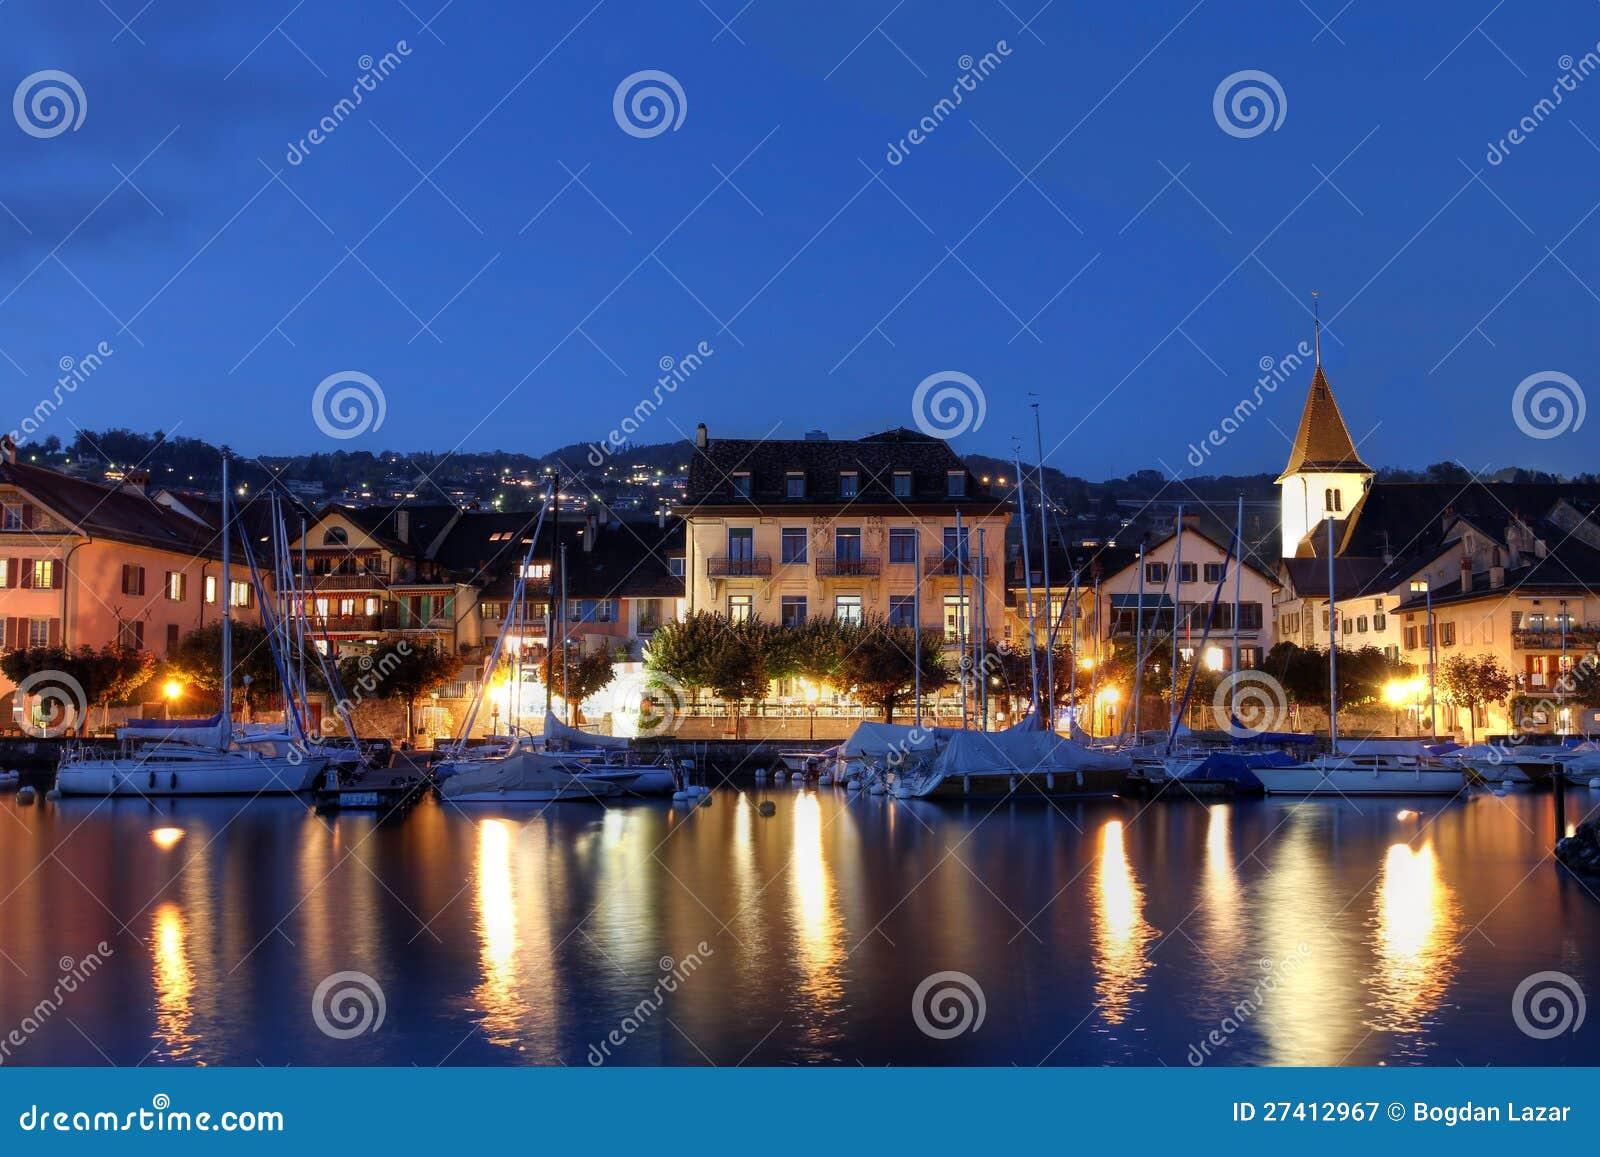 Lutry Switzerland  city photos : Lutry, Switzerland Royalty Free Stock Photography Image: 27412967